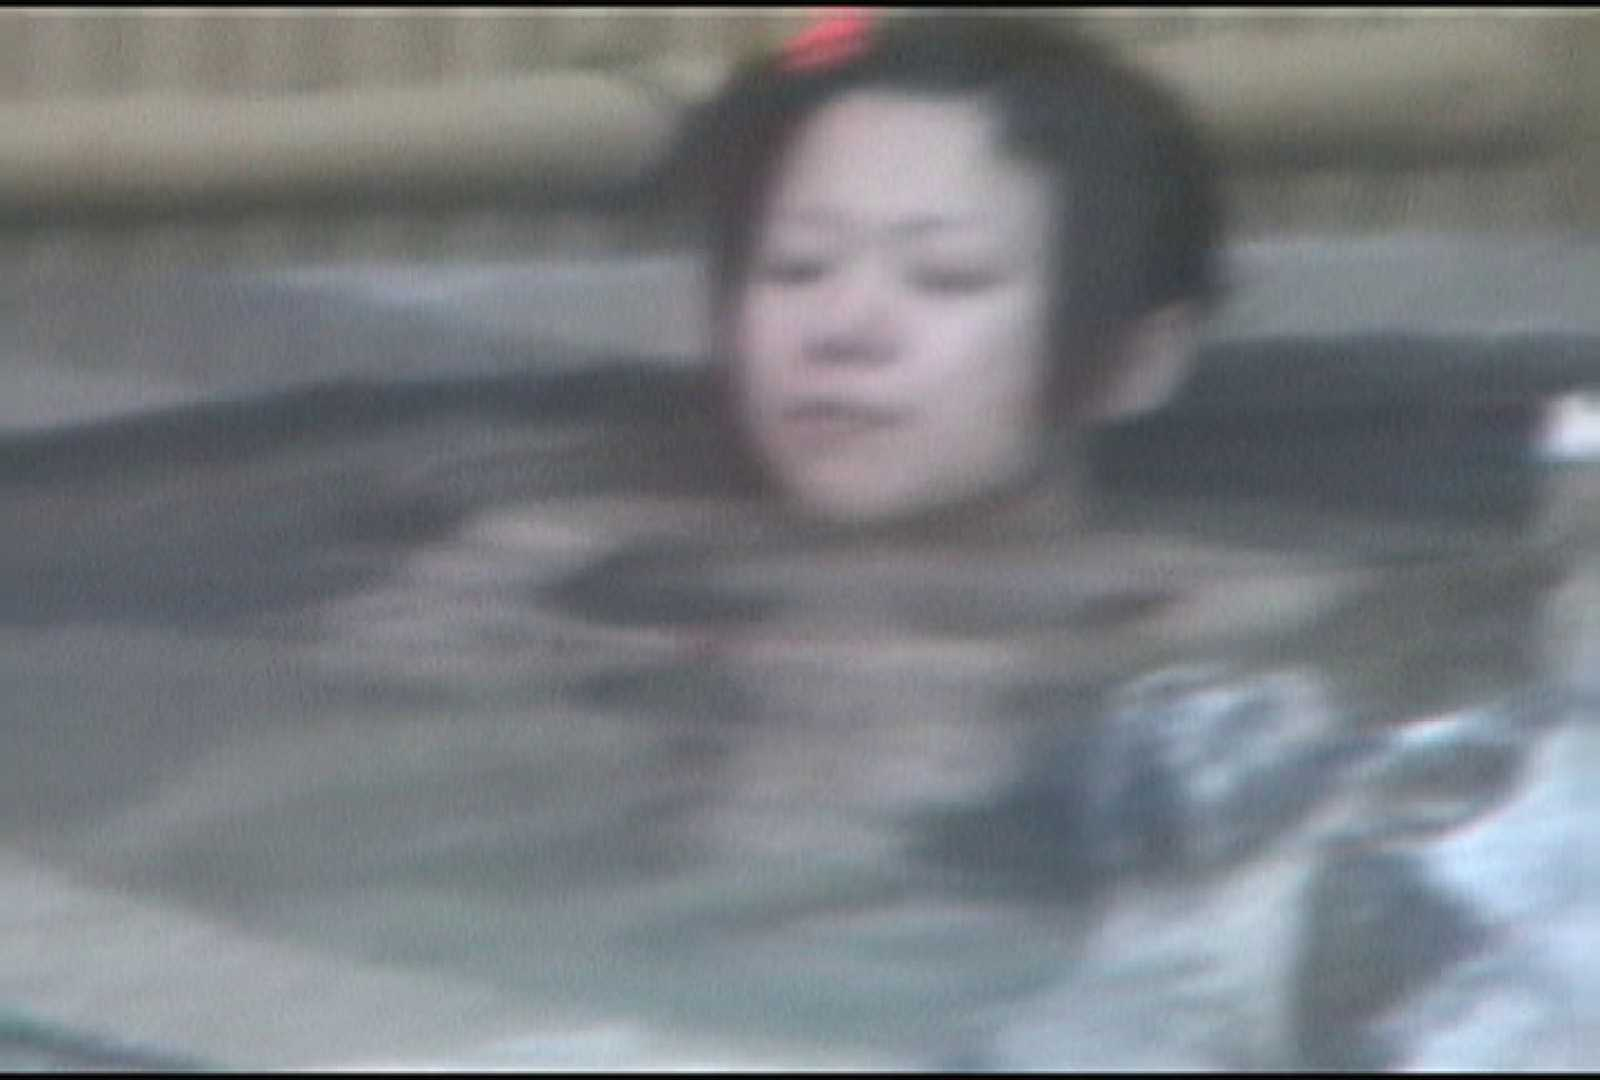 Aquaな露天風呂Vol.175 盗撮 ワレメ無修正動画無料 71連発 26